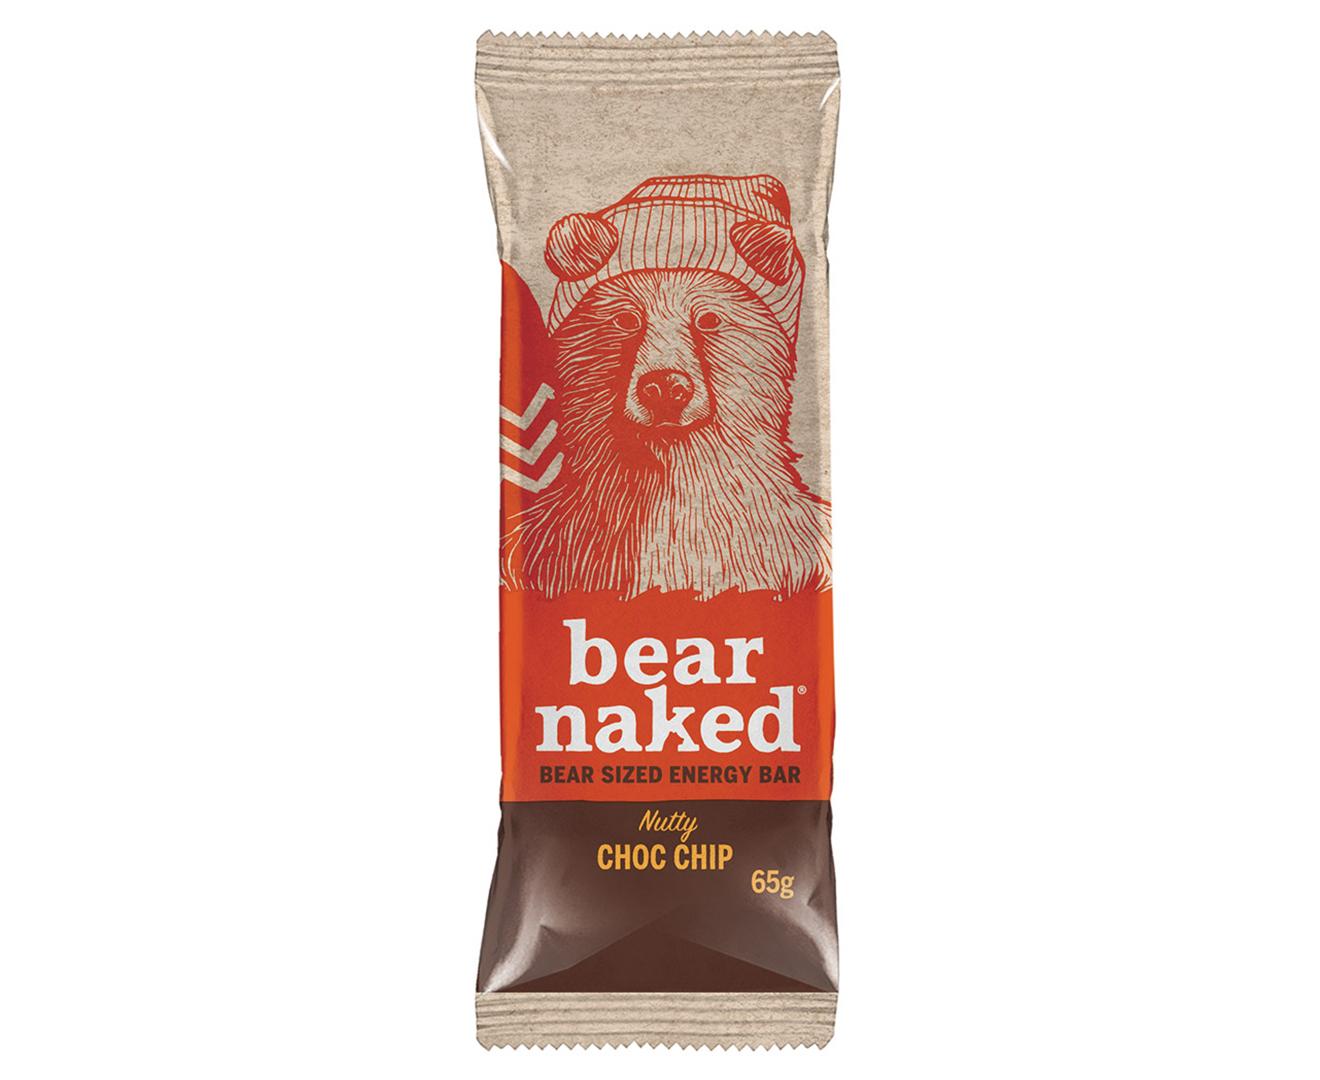 8 x Bear Naked Nutty Choc Chip Energy Bar 65g   eBay